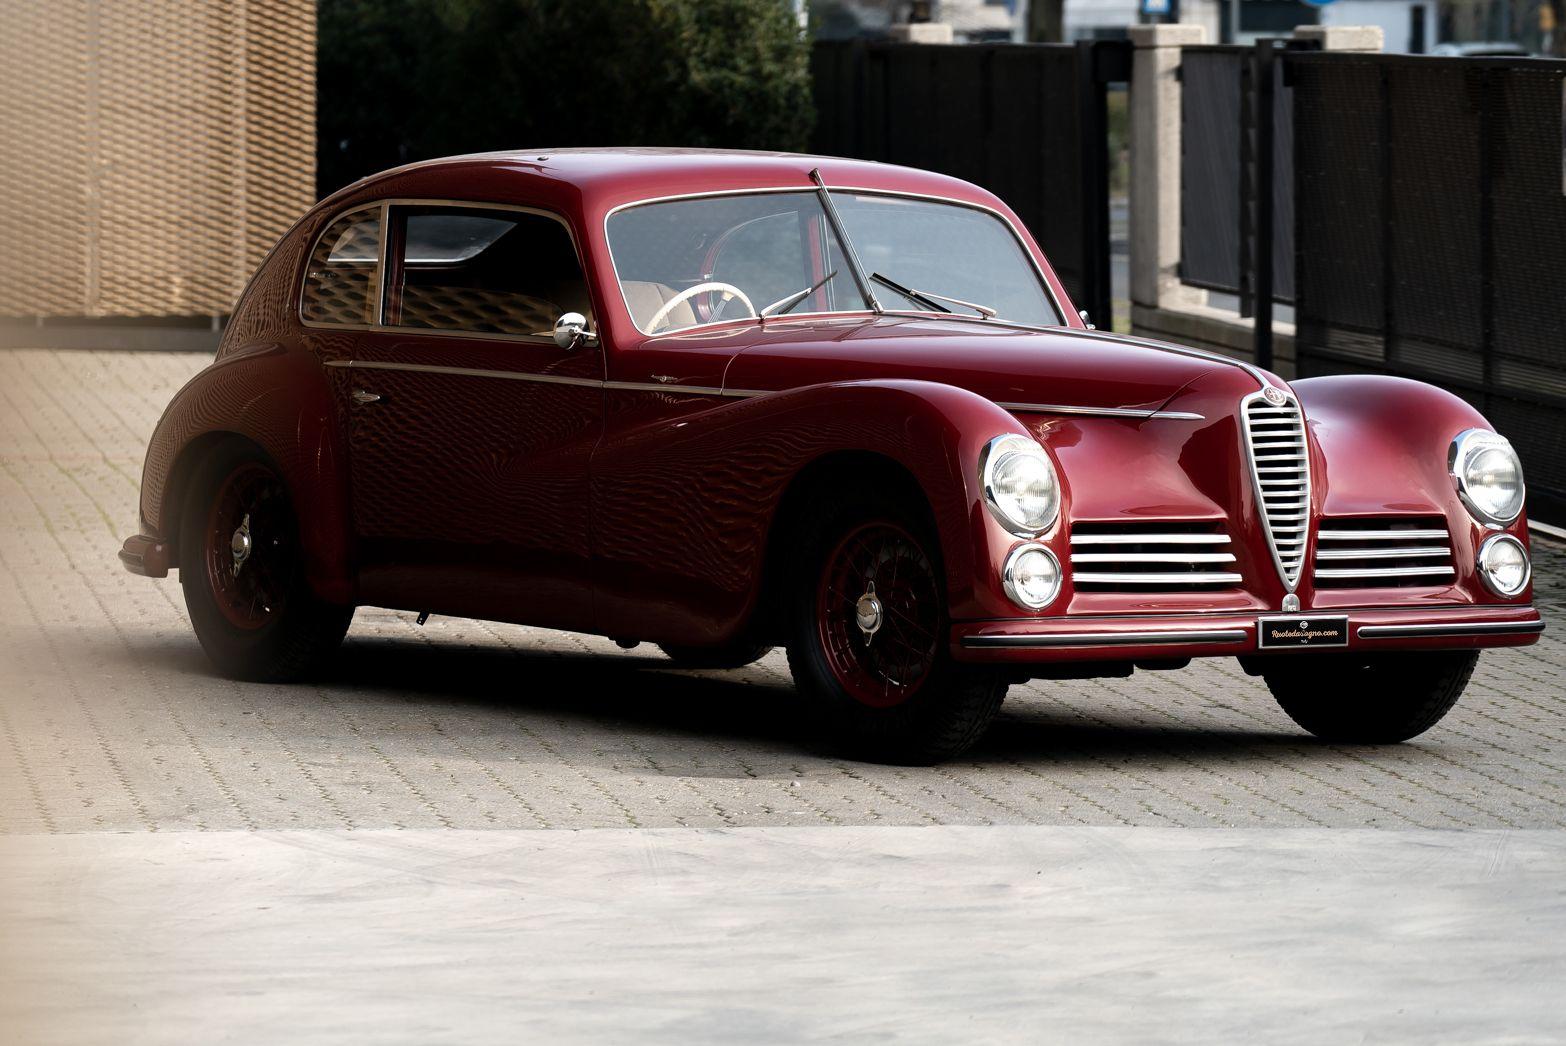 1947 Alfa Romeo Freccia d'oro 6C 2500 Sport 61678